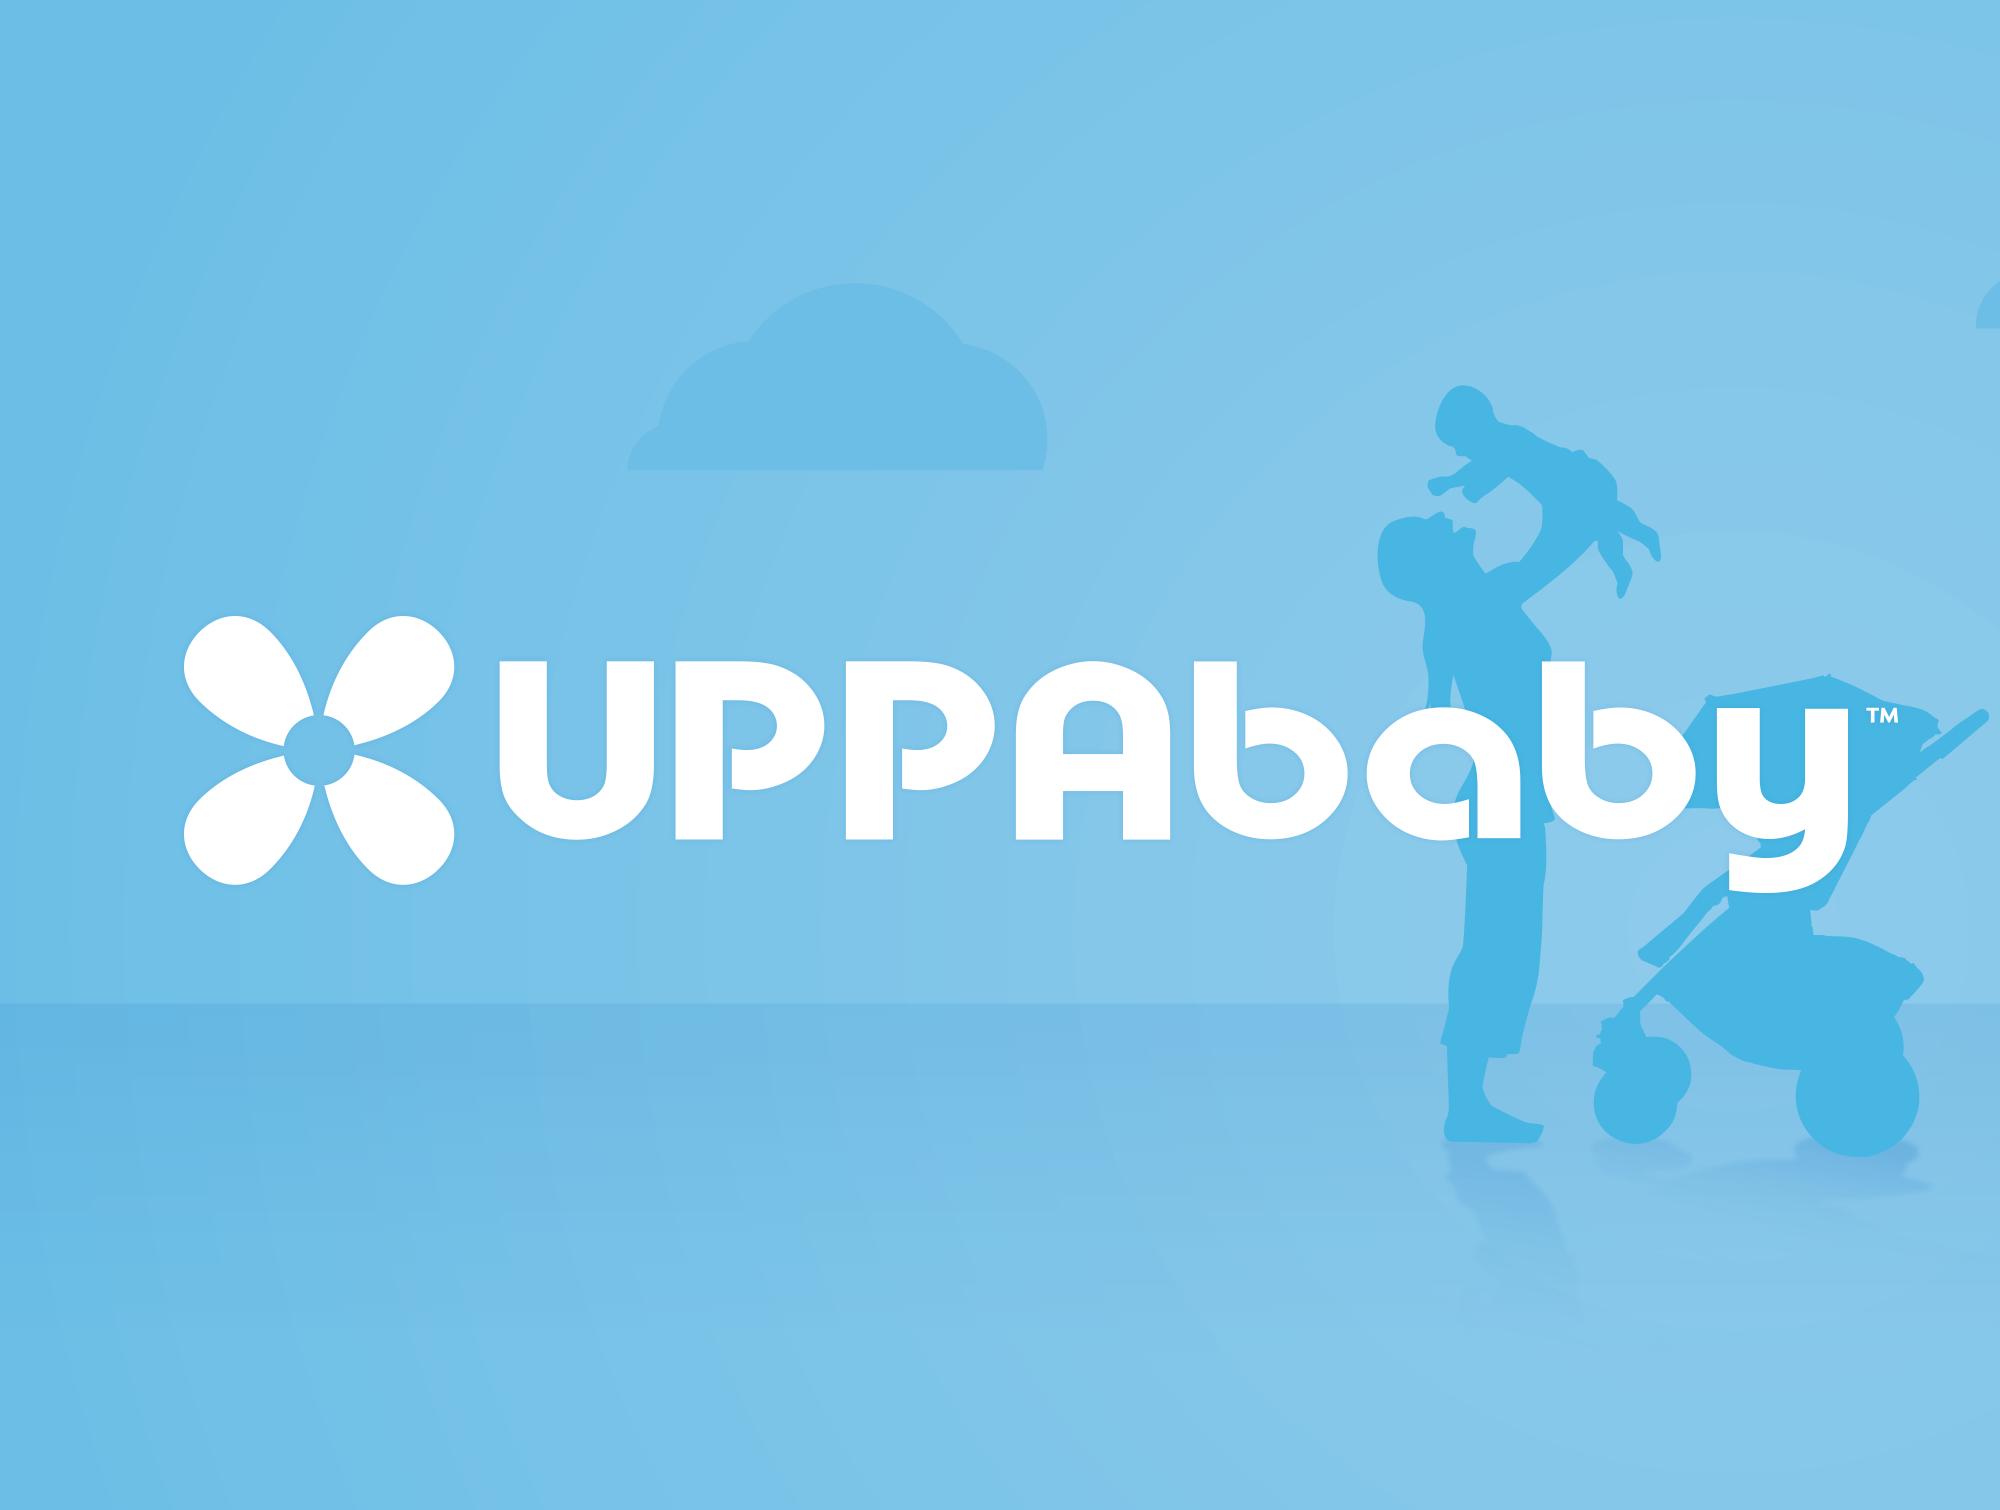 UppababyBranding